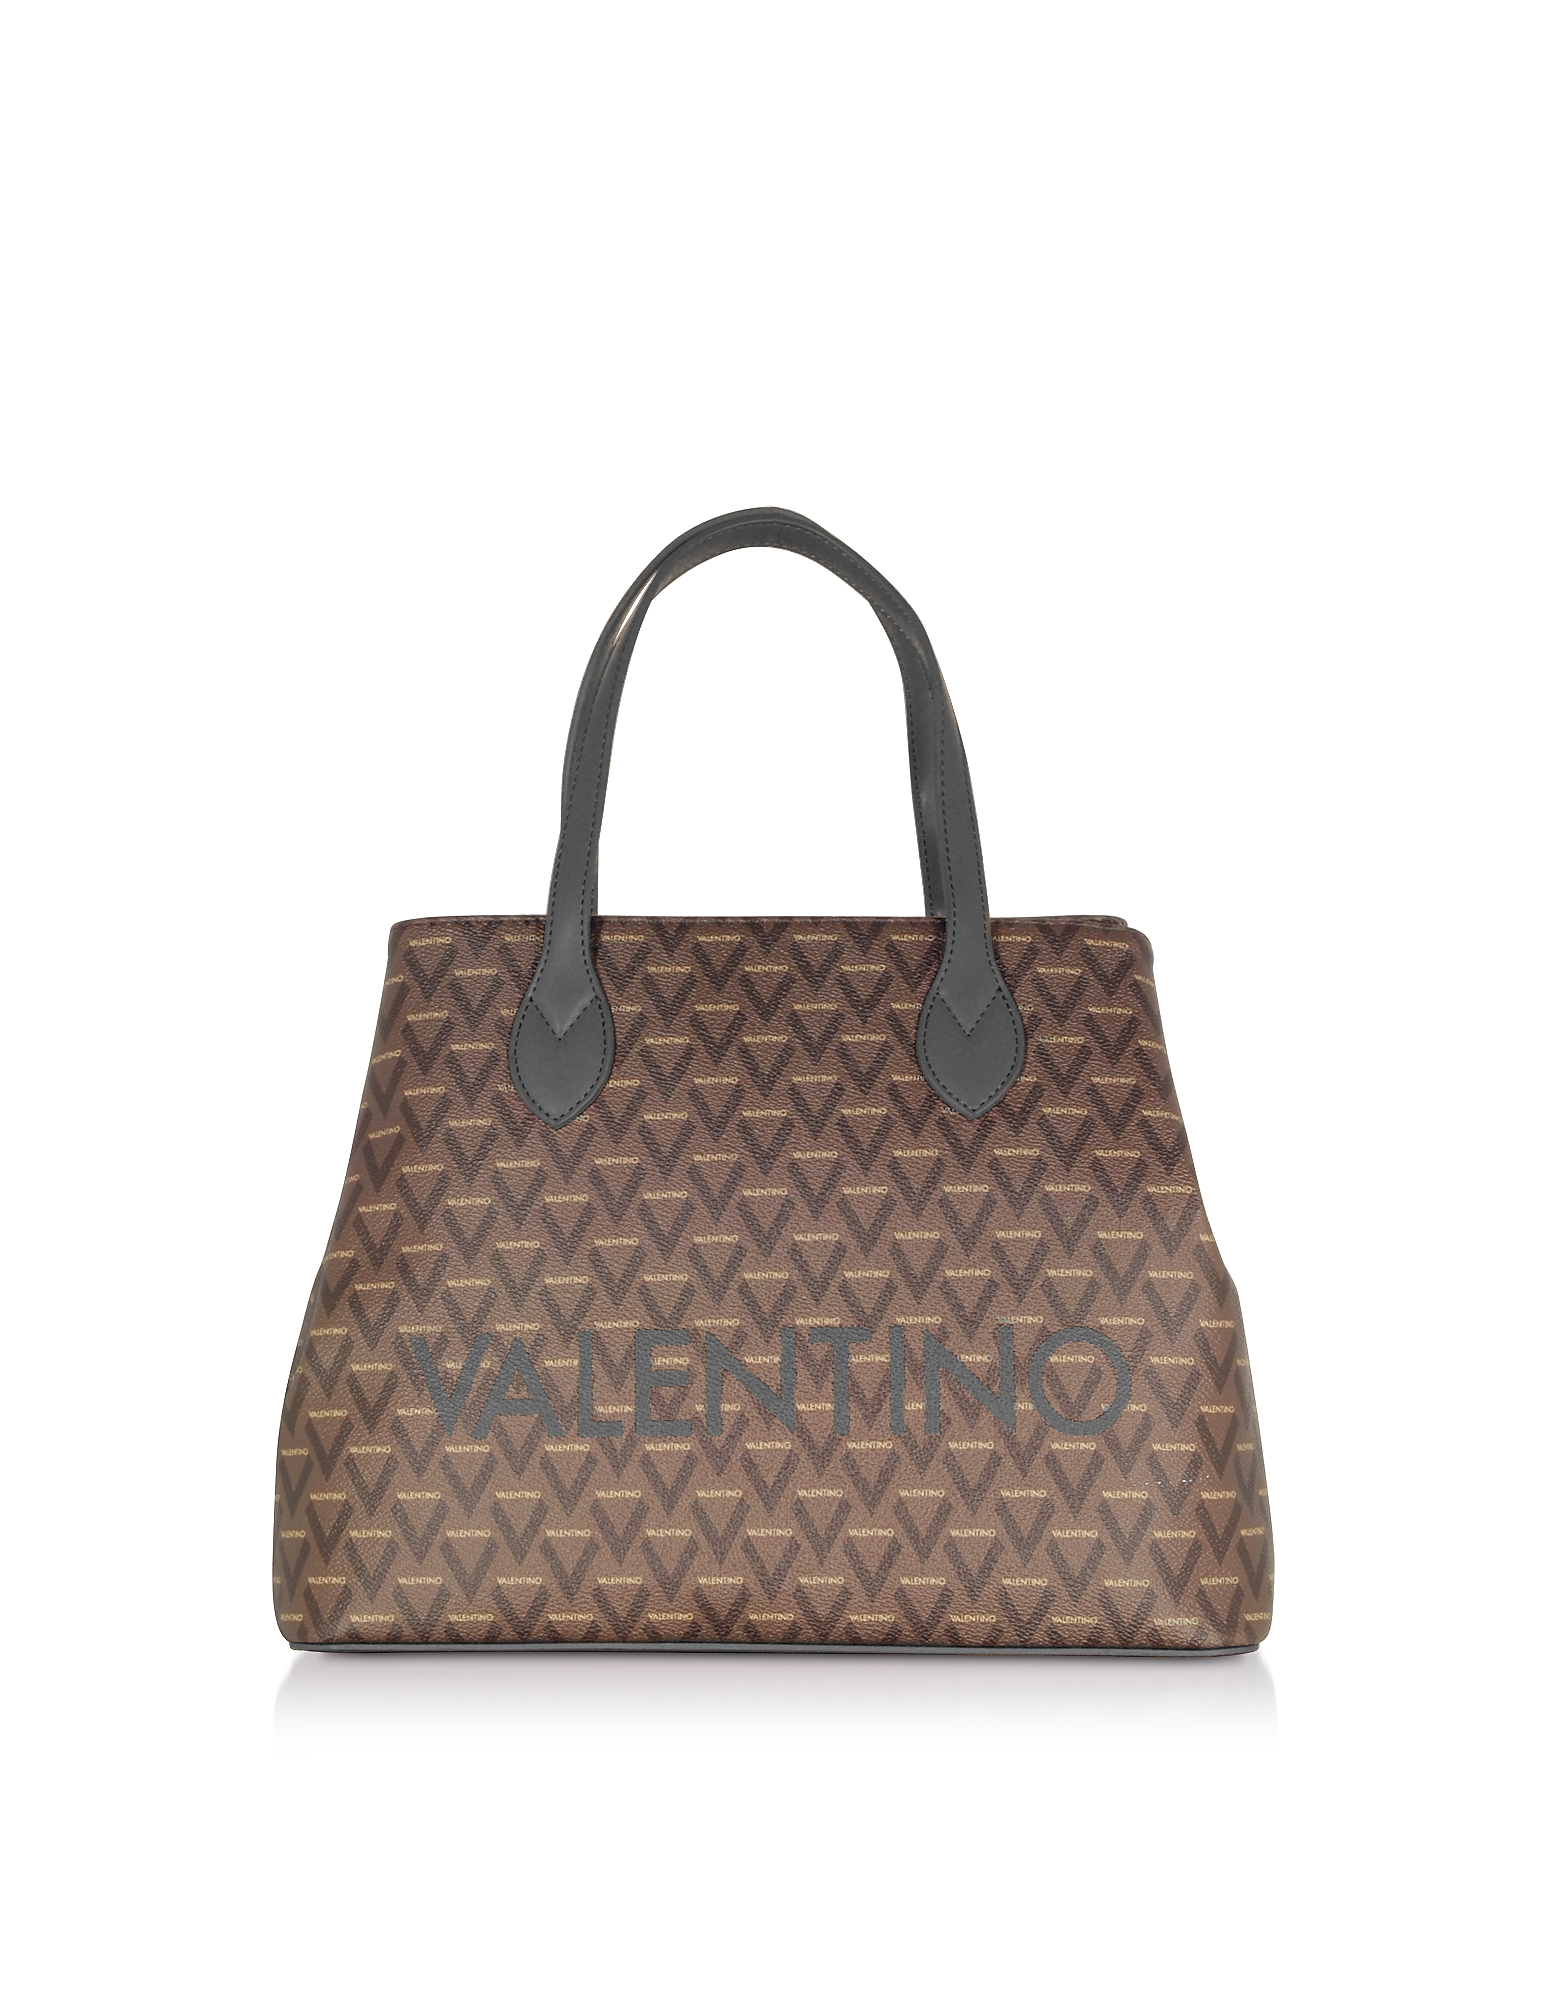 Valentino by Mario Valentino Designer Handbags, Liuto Signature Eco Leather Tote Bag